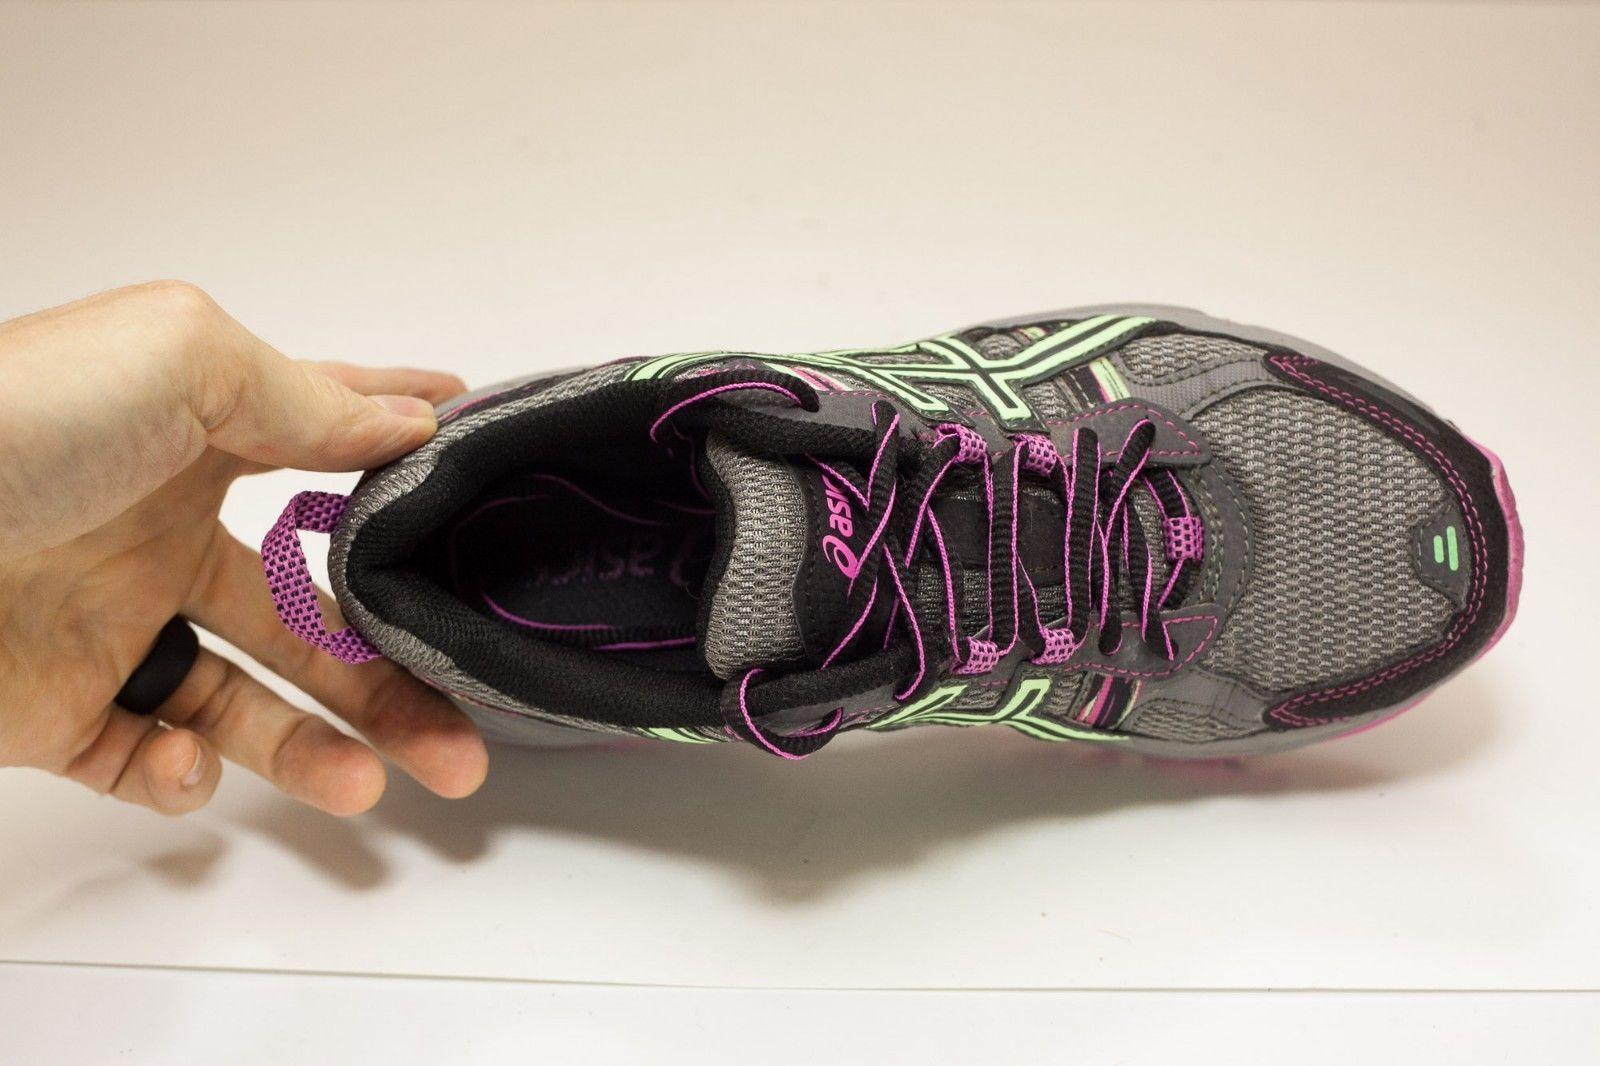 Asics Gel-Venture US 6 D Gray Purple Running Shoes Women's